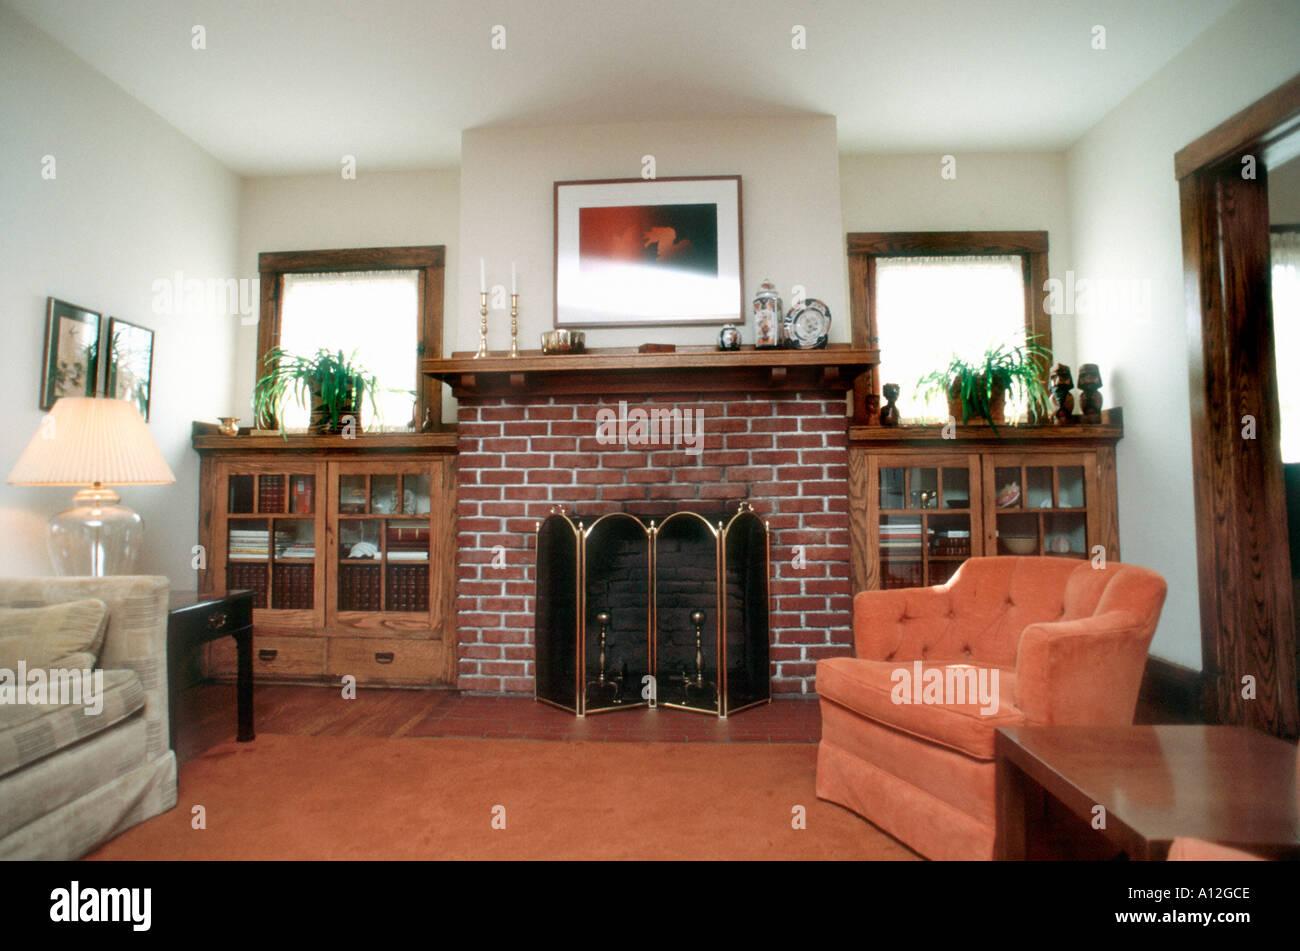 La inversión usa American Homes casa familiar 'single' Interior salón, chimenea de ladrillo Imagen De Stock